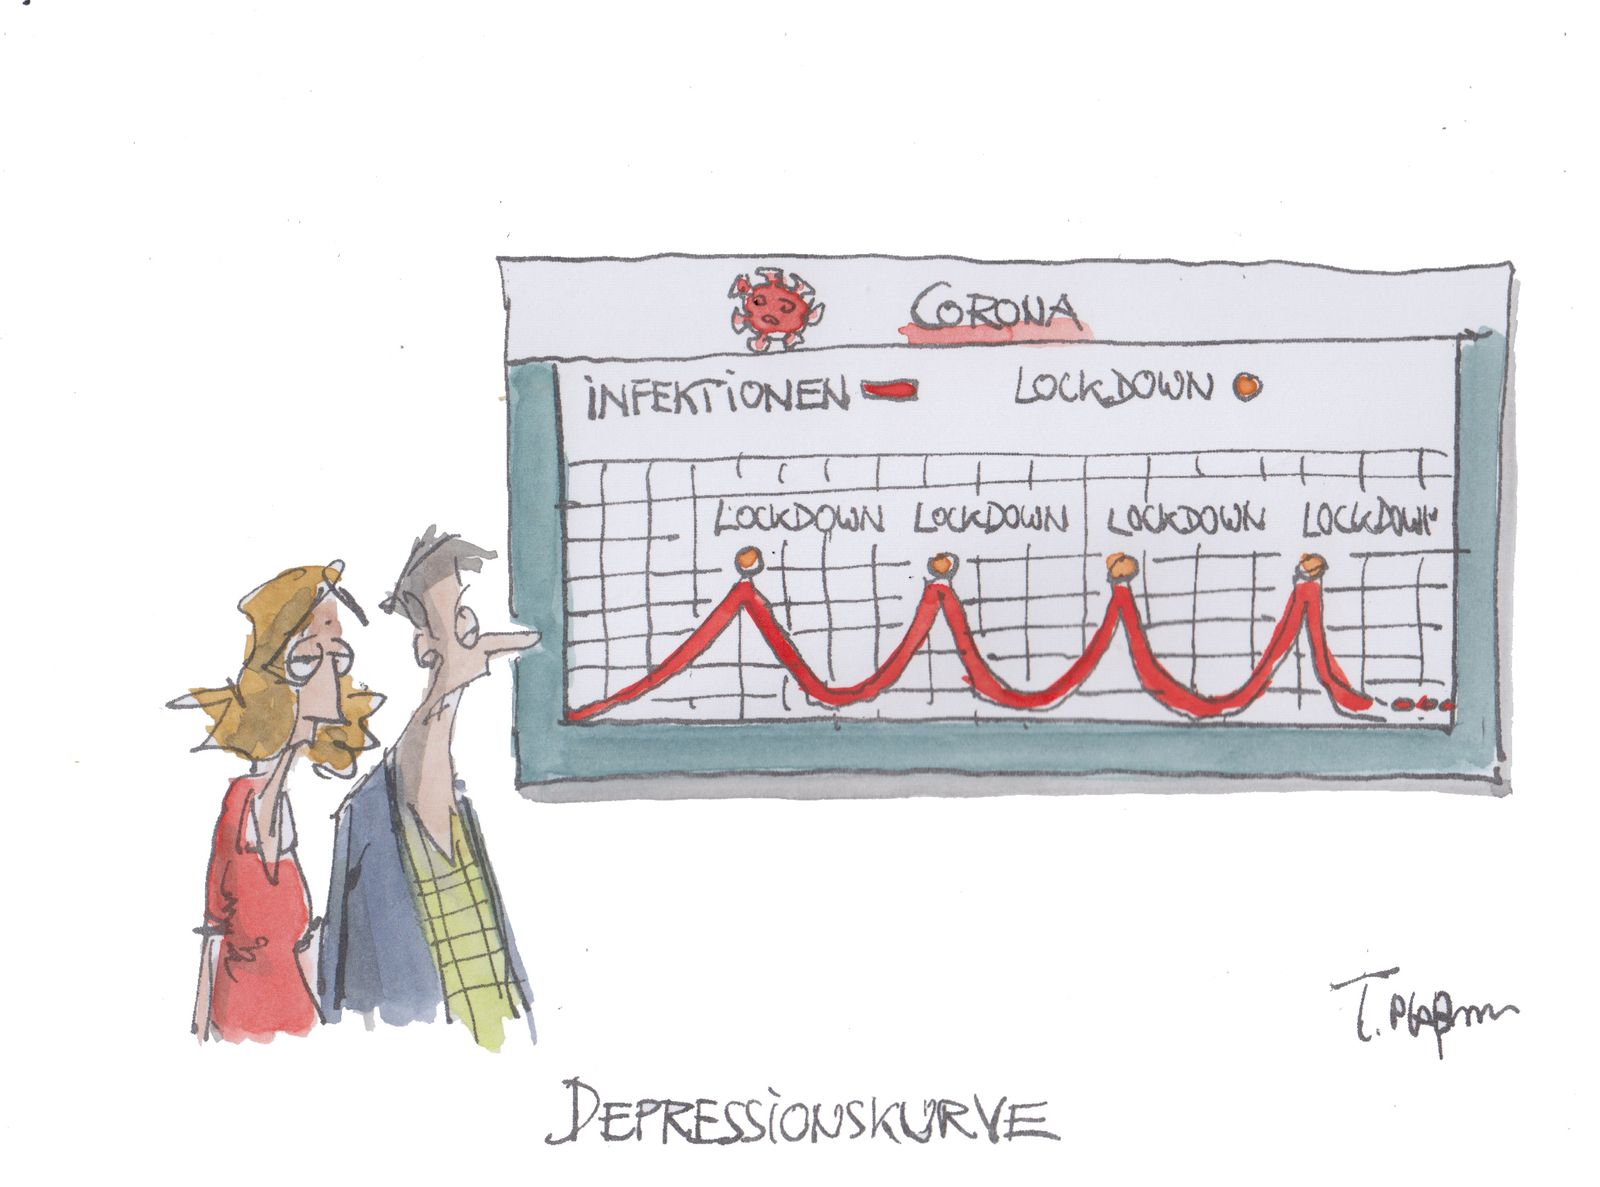 depressionskurve